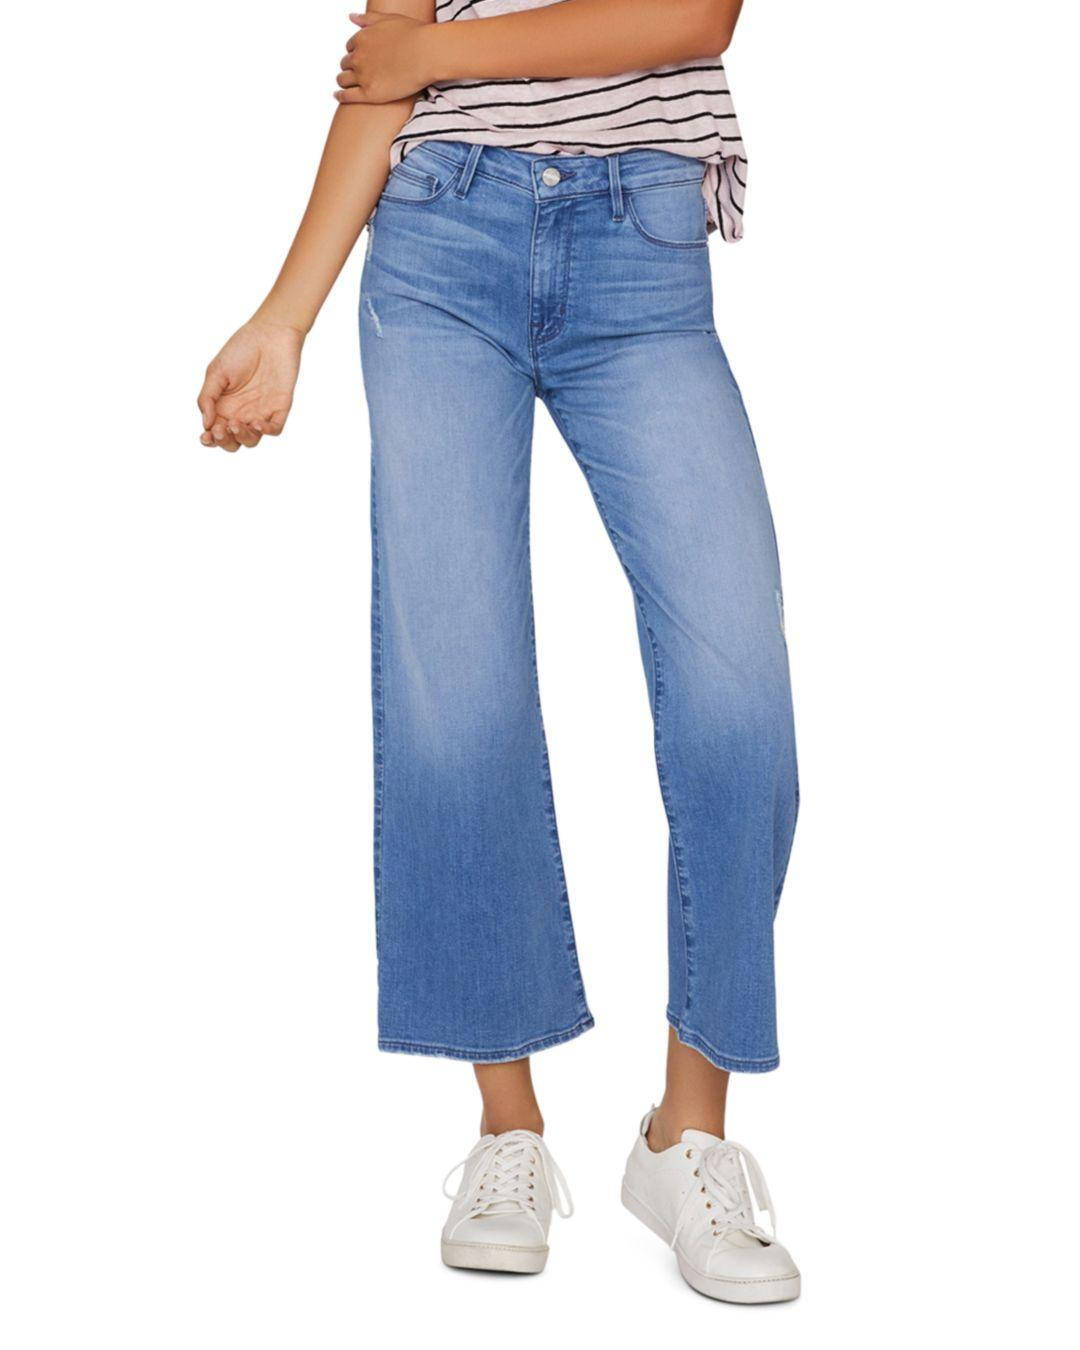 4b27bc28 Sanctuary Non Conformist Cropped Wide - Leg Jeans In Solano Blue in ...